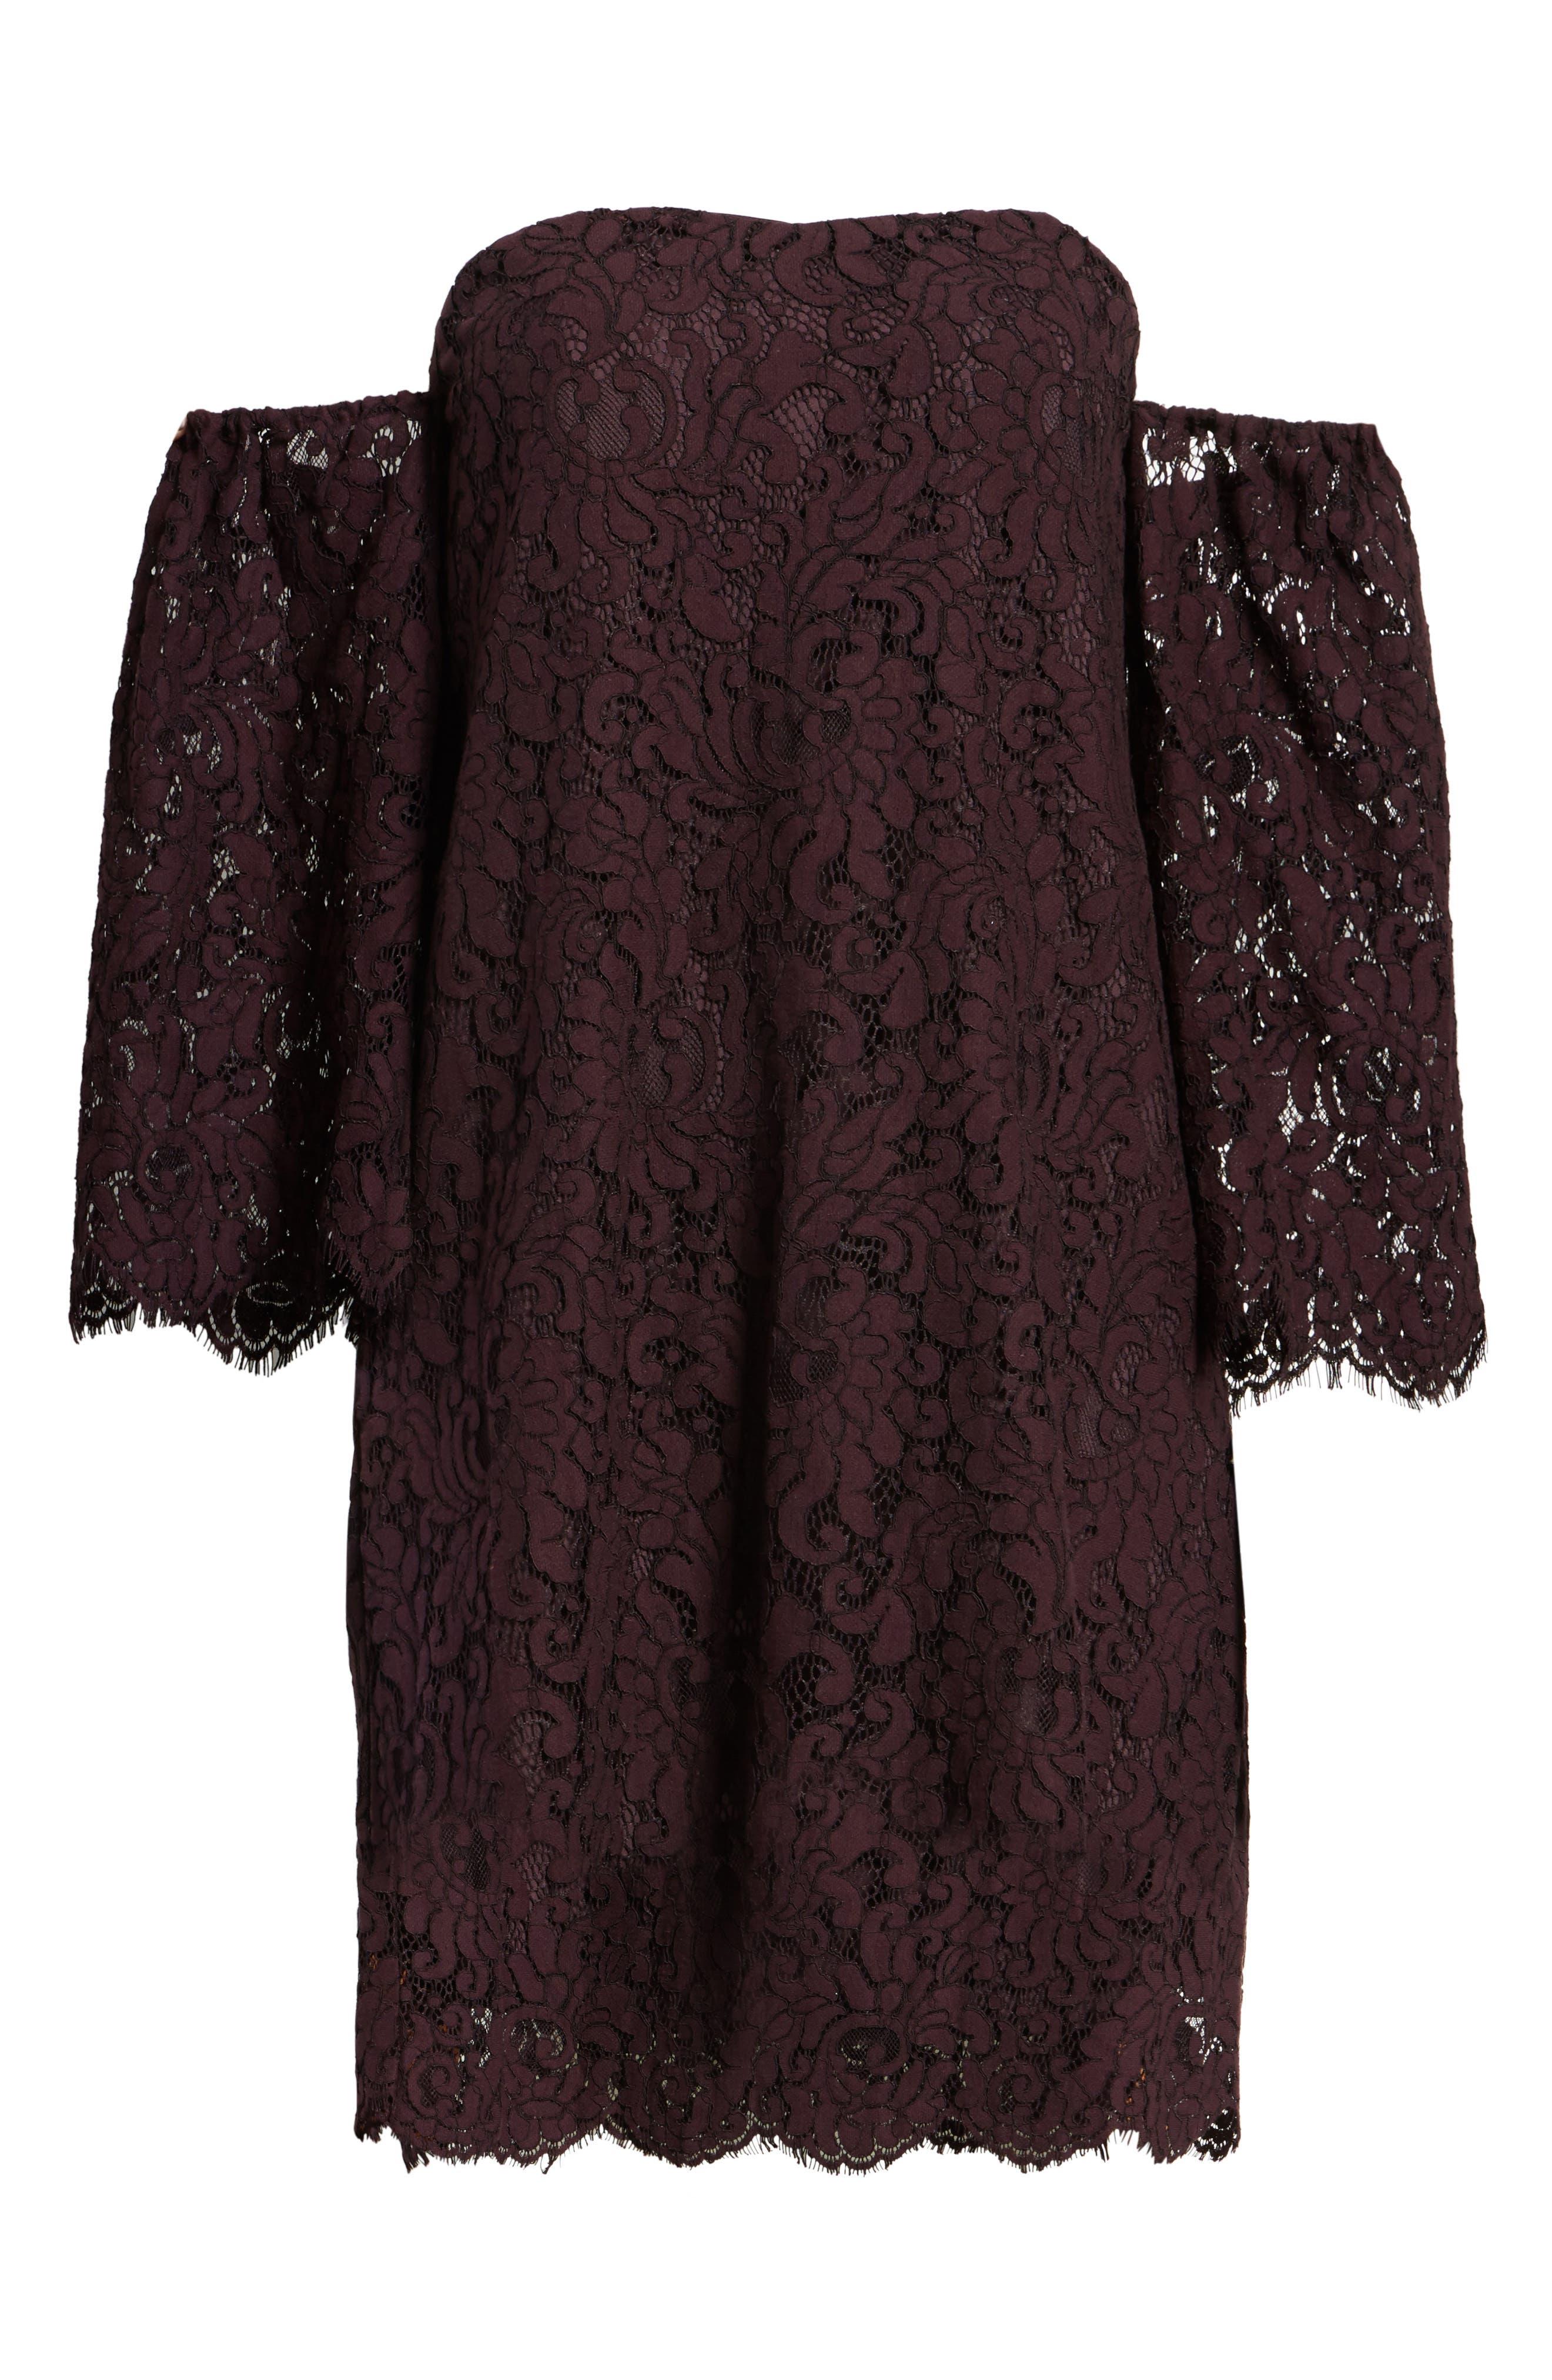 Adalira Off the Shoulder Lace Dress,                             Alternate thumbnail 6, color,                             930